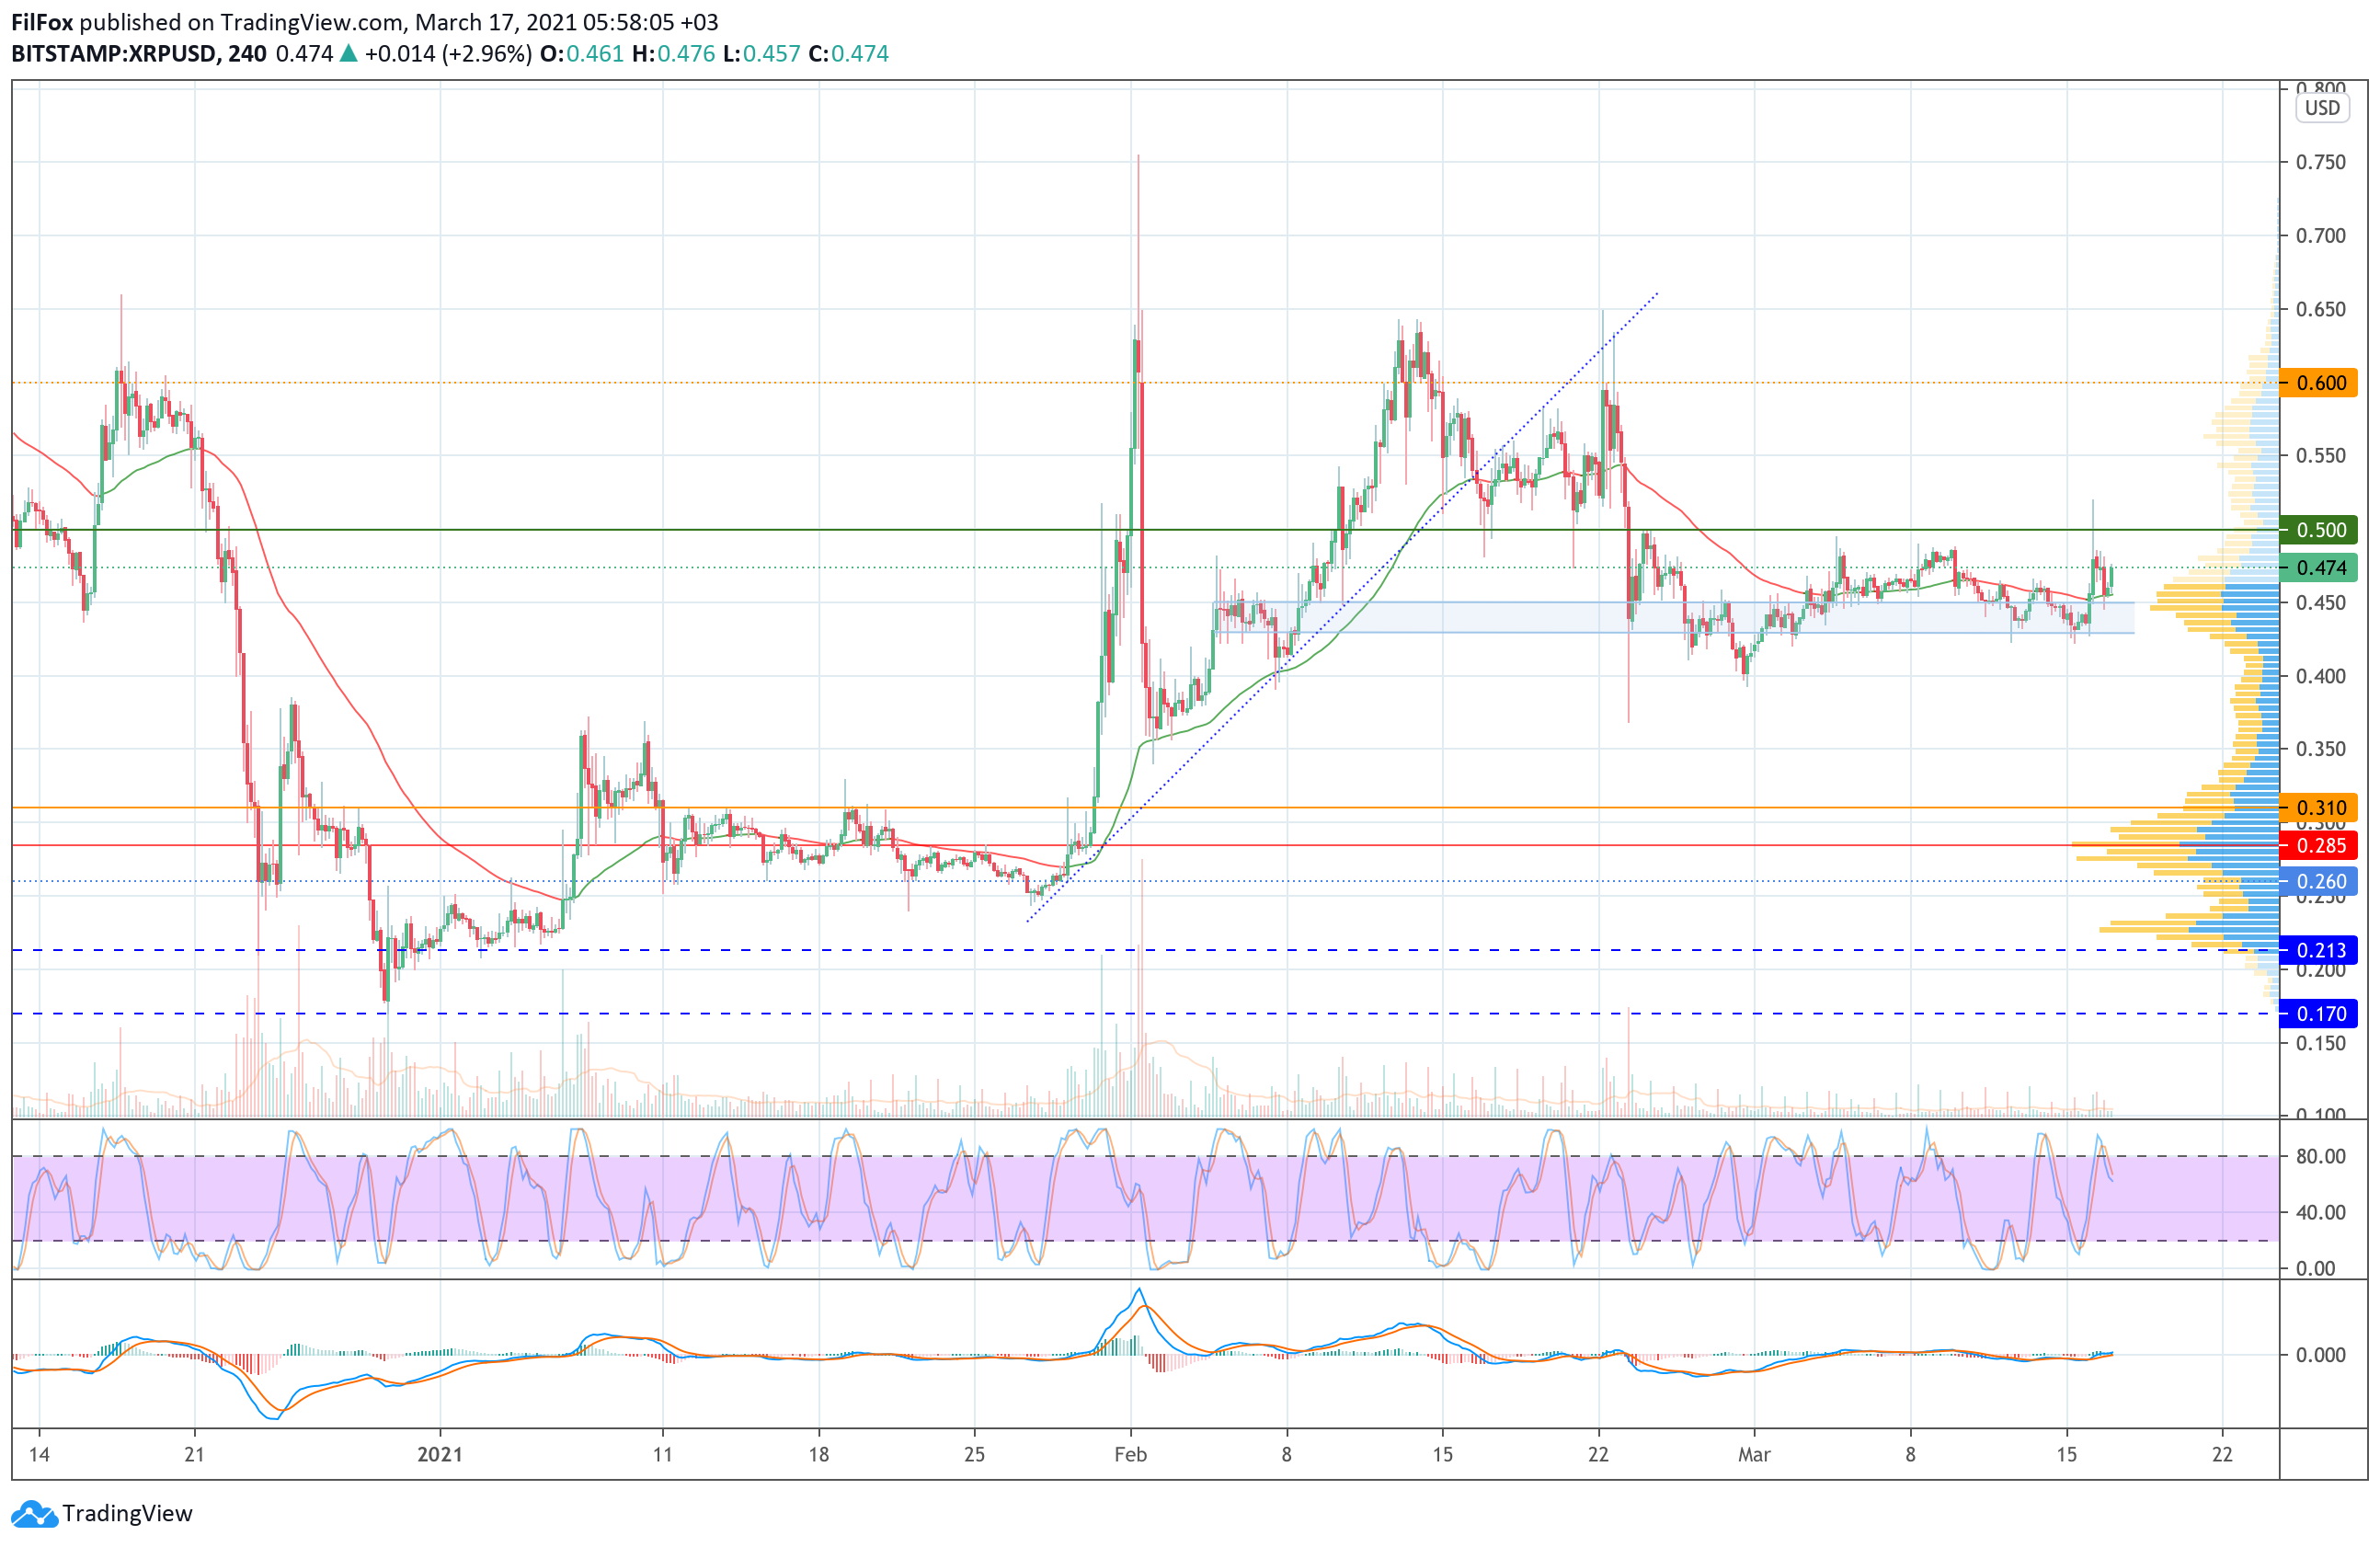 Анализ цен Bitcoin, Ethereum, XRP на 17.03.2021